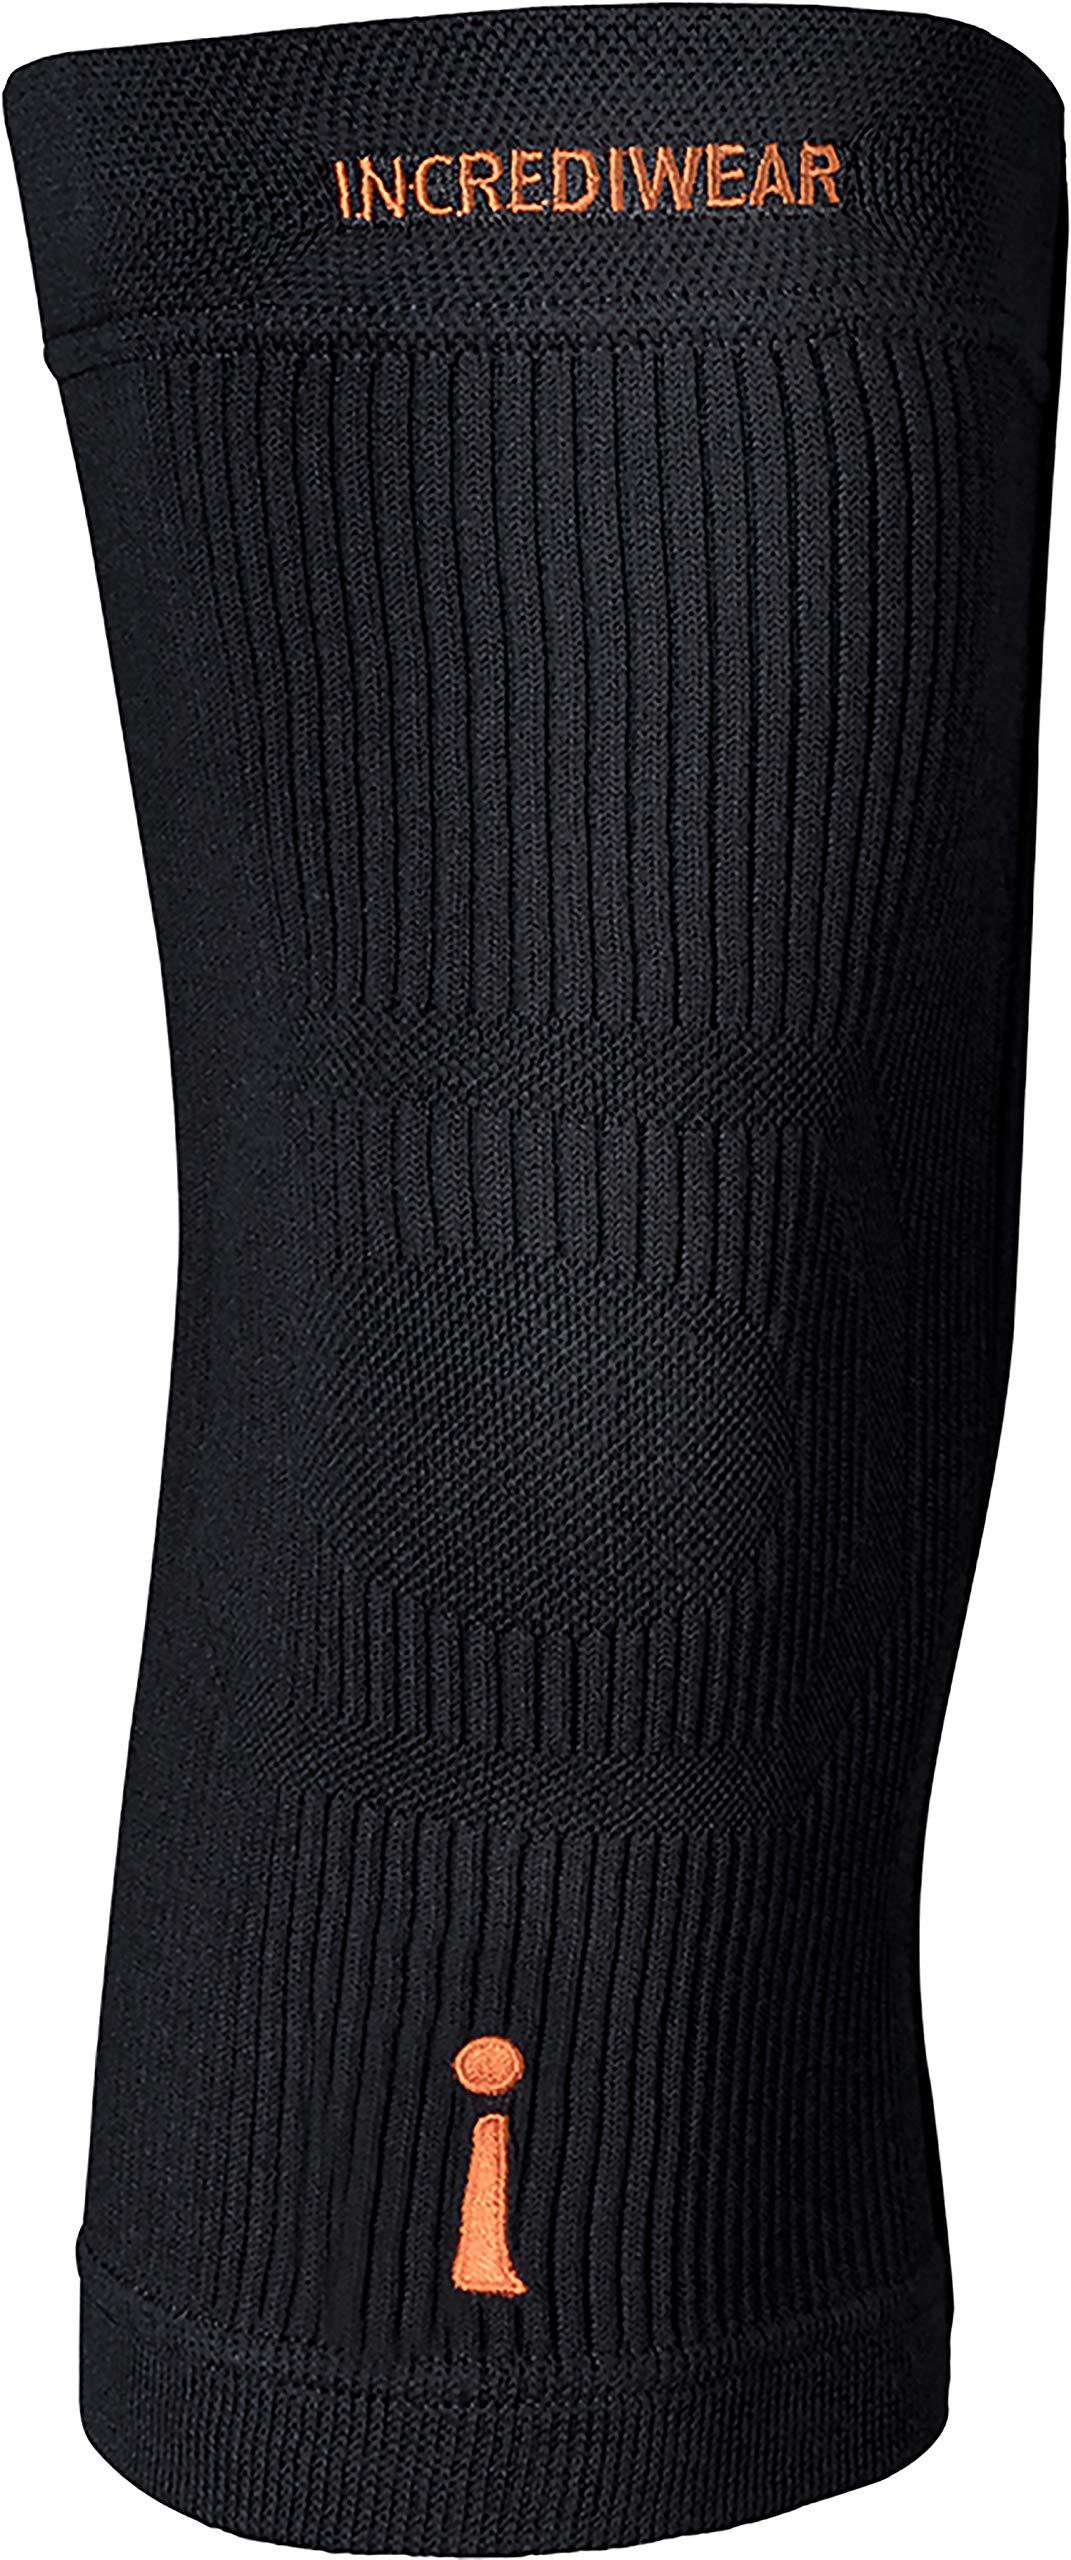 Incrediwear Knee Sleeve, Black, XL by Incrediwear